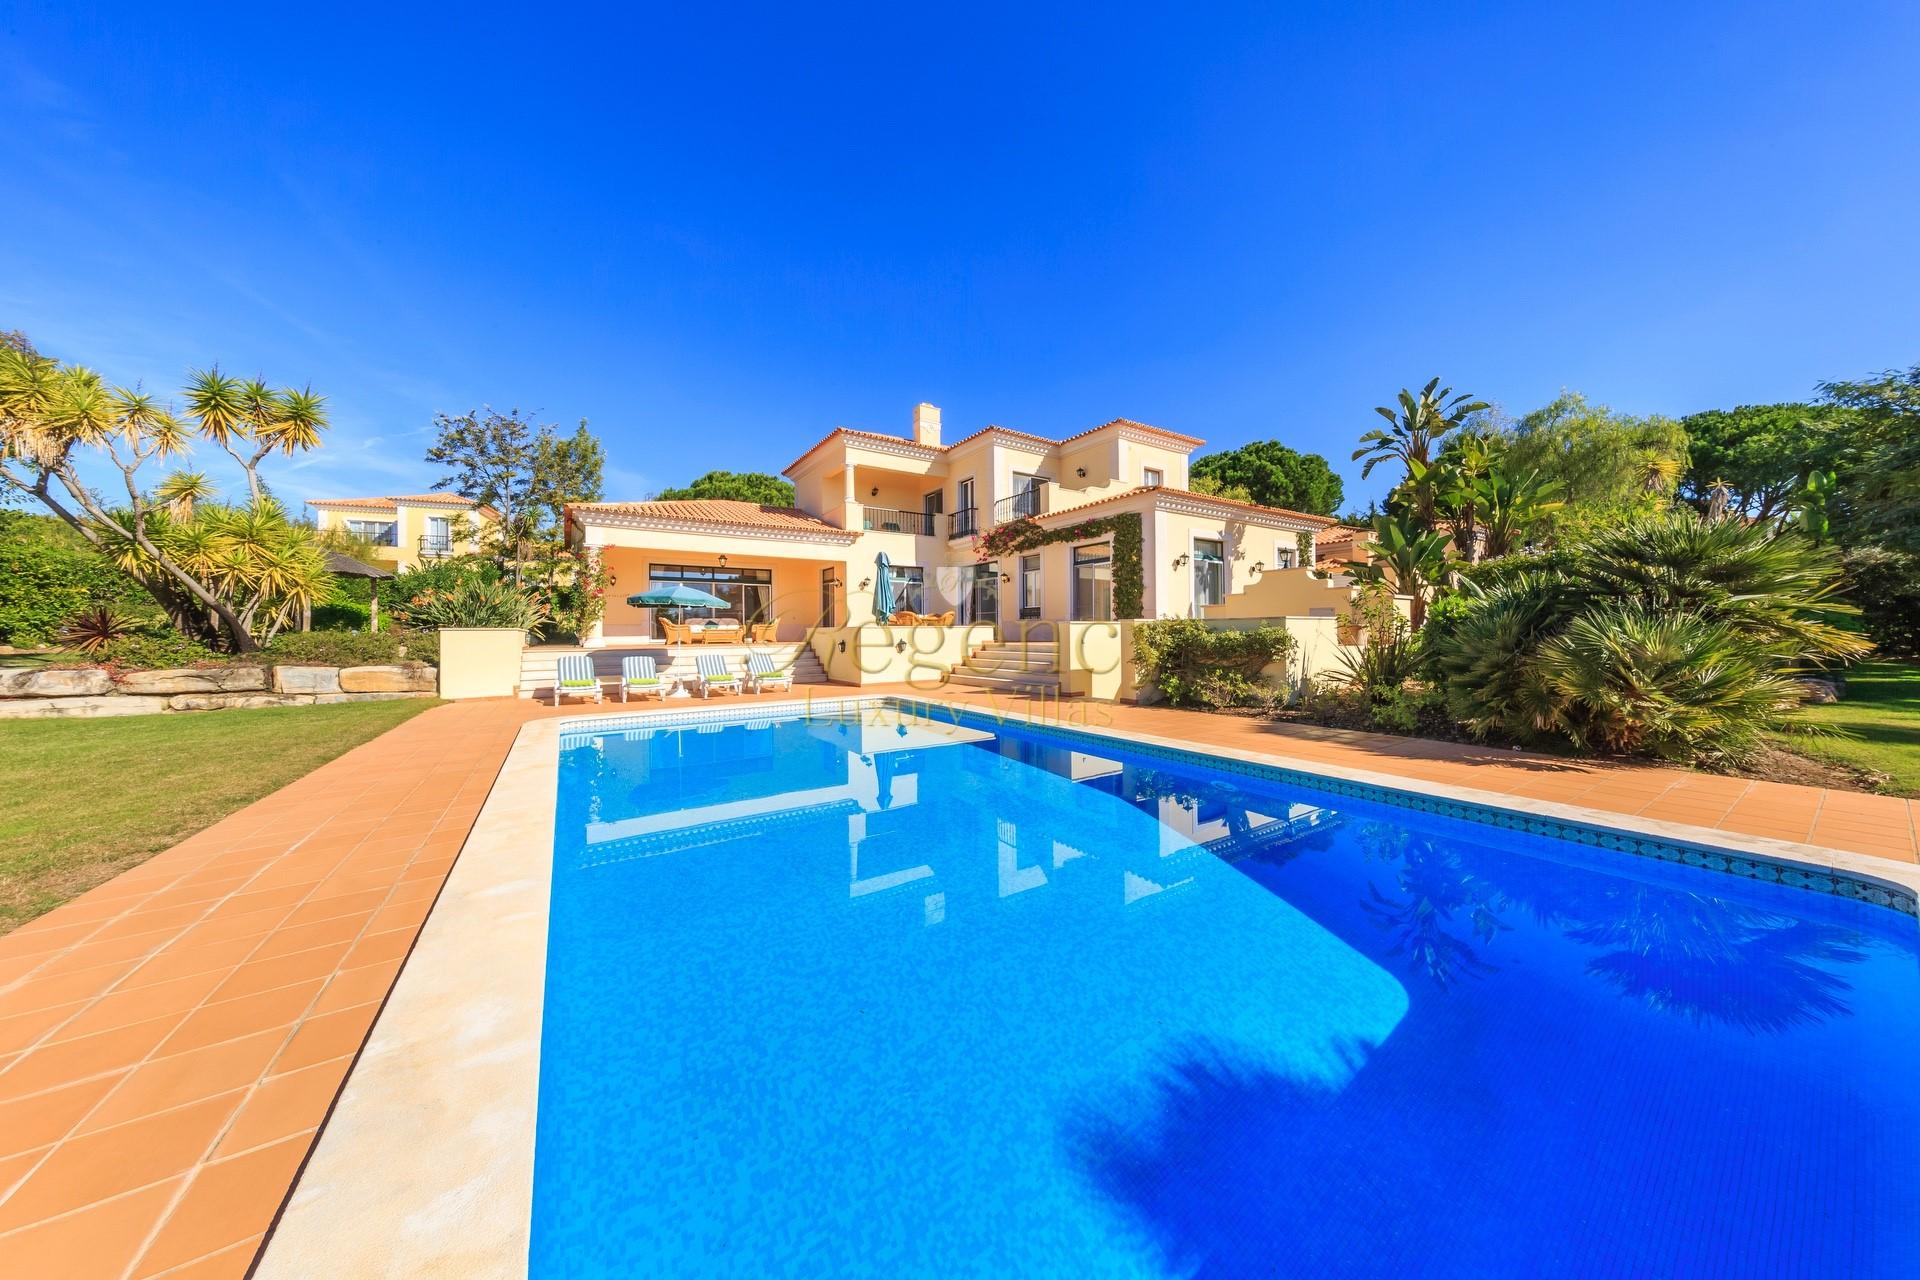 4 Bedrooms Luxury Villa To Rent In The Vale Do Lobo Resort Fazenda Santiago With Private Swimming Pool Luxury Villa Rental Algarve Portugal Villa Inca Rose Regency Luxury Villas44